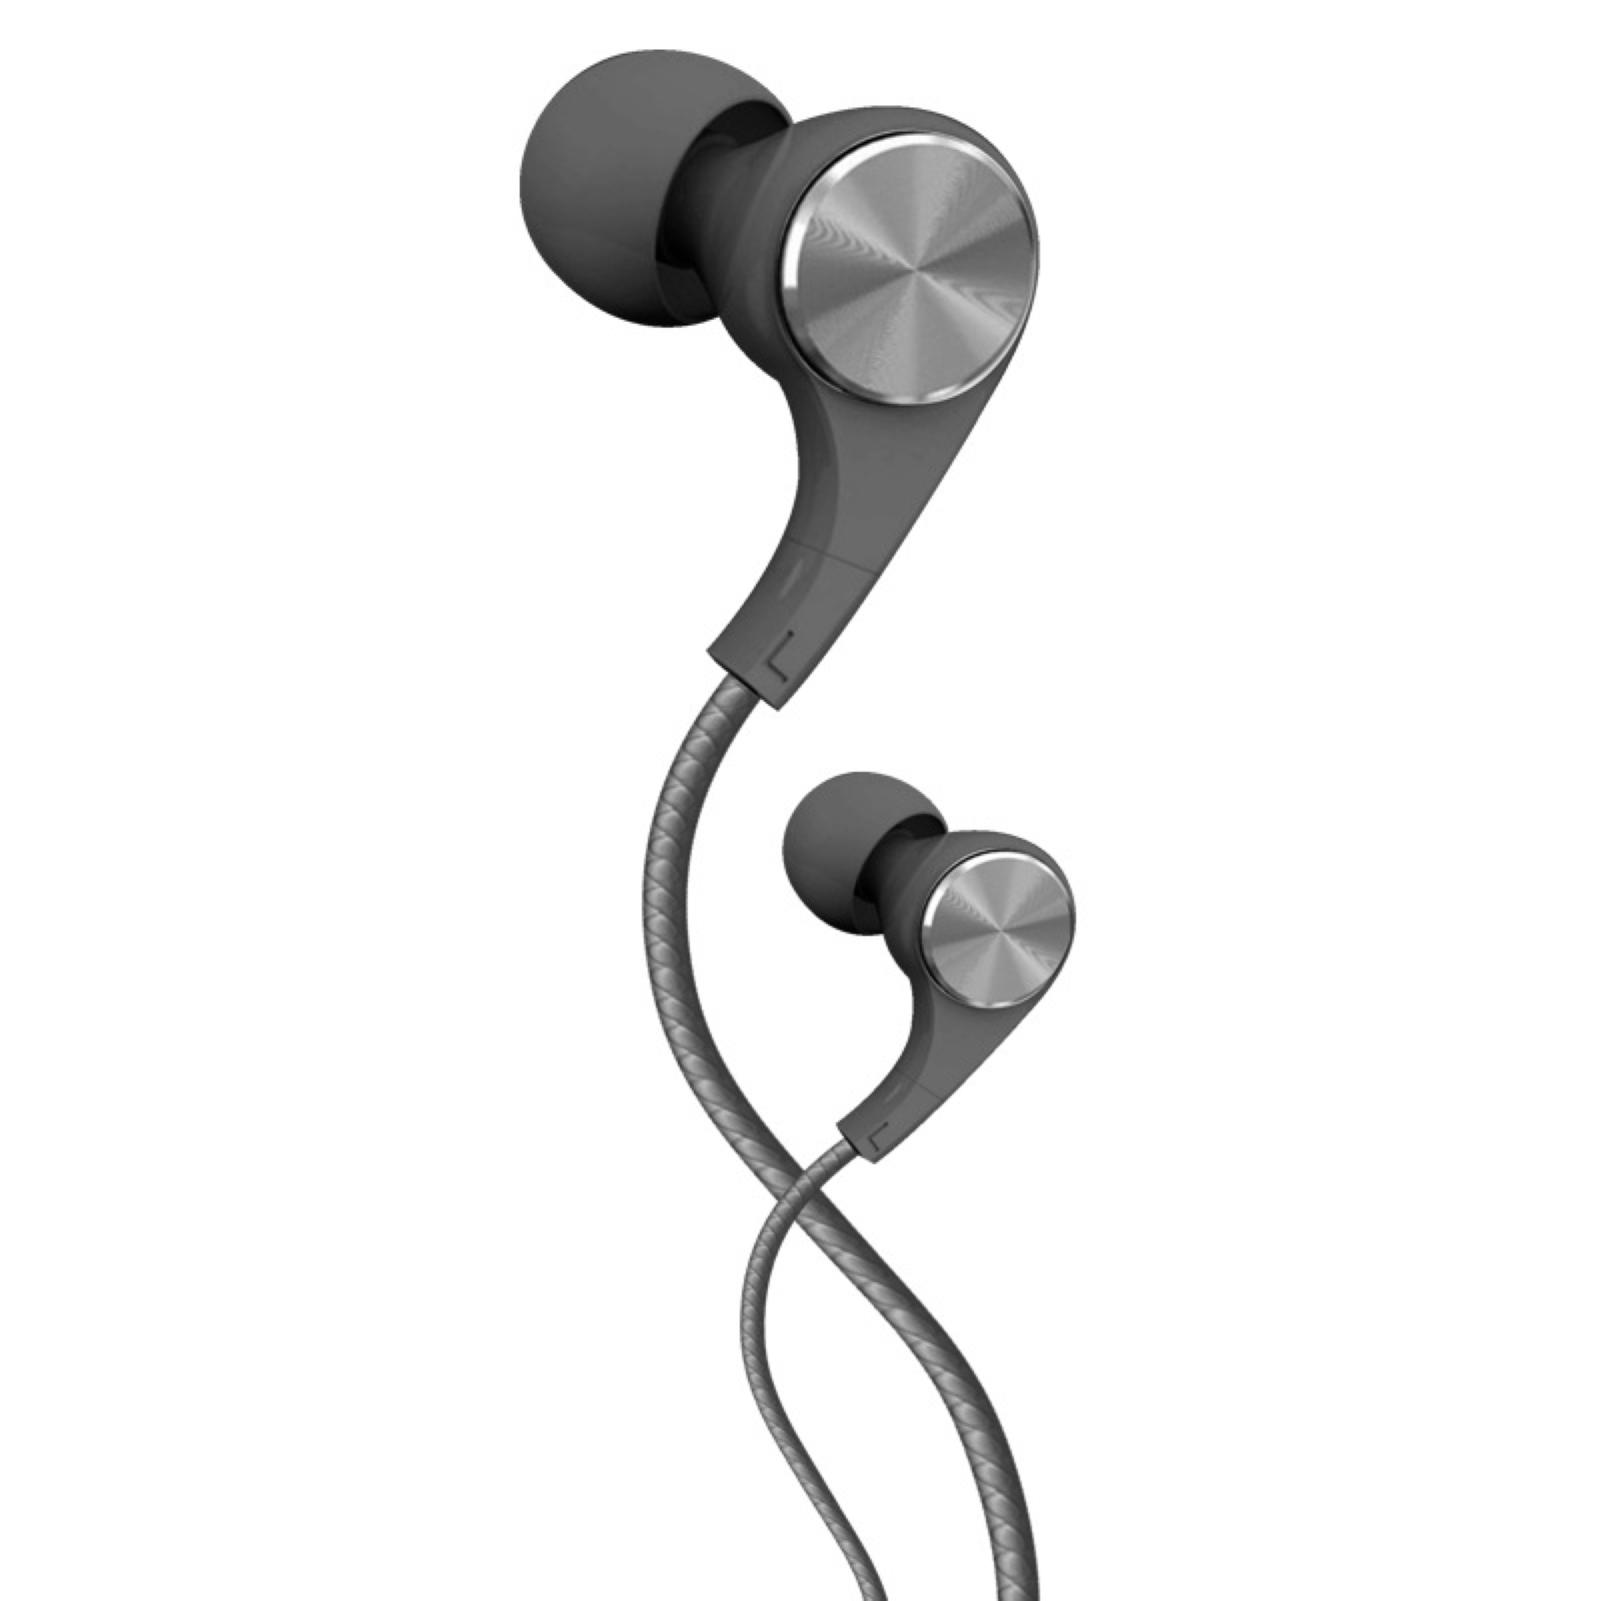 Mini Portable 3.5mm Heavy Bass HIFI In-Ear Headphones Dual Speakers Subwoofer Stereo Games Sports earphones for smartphones